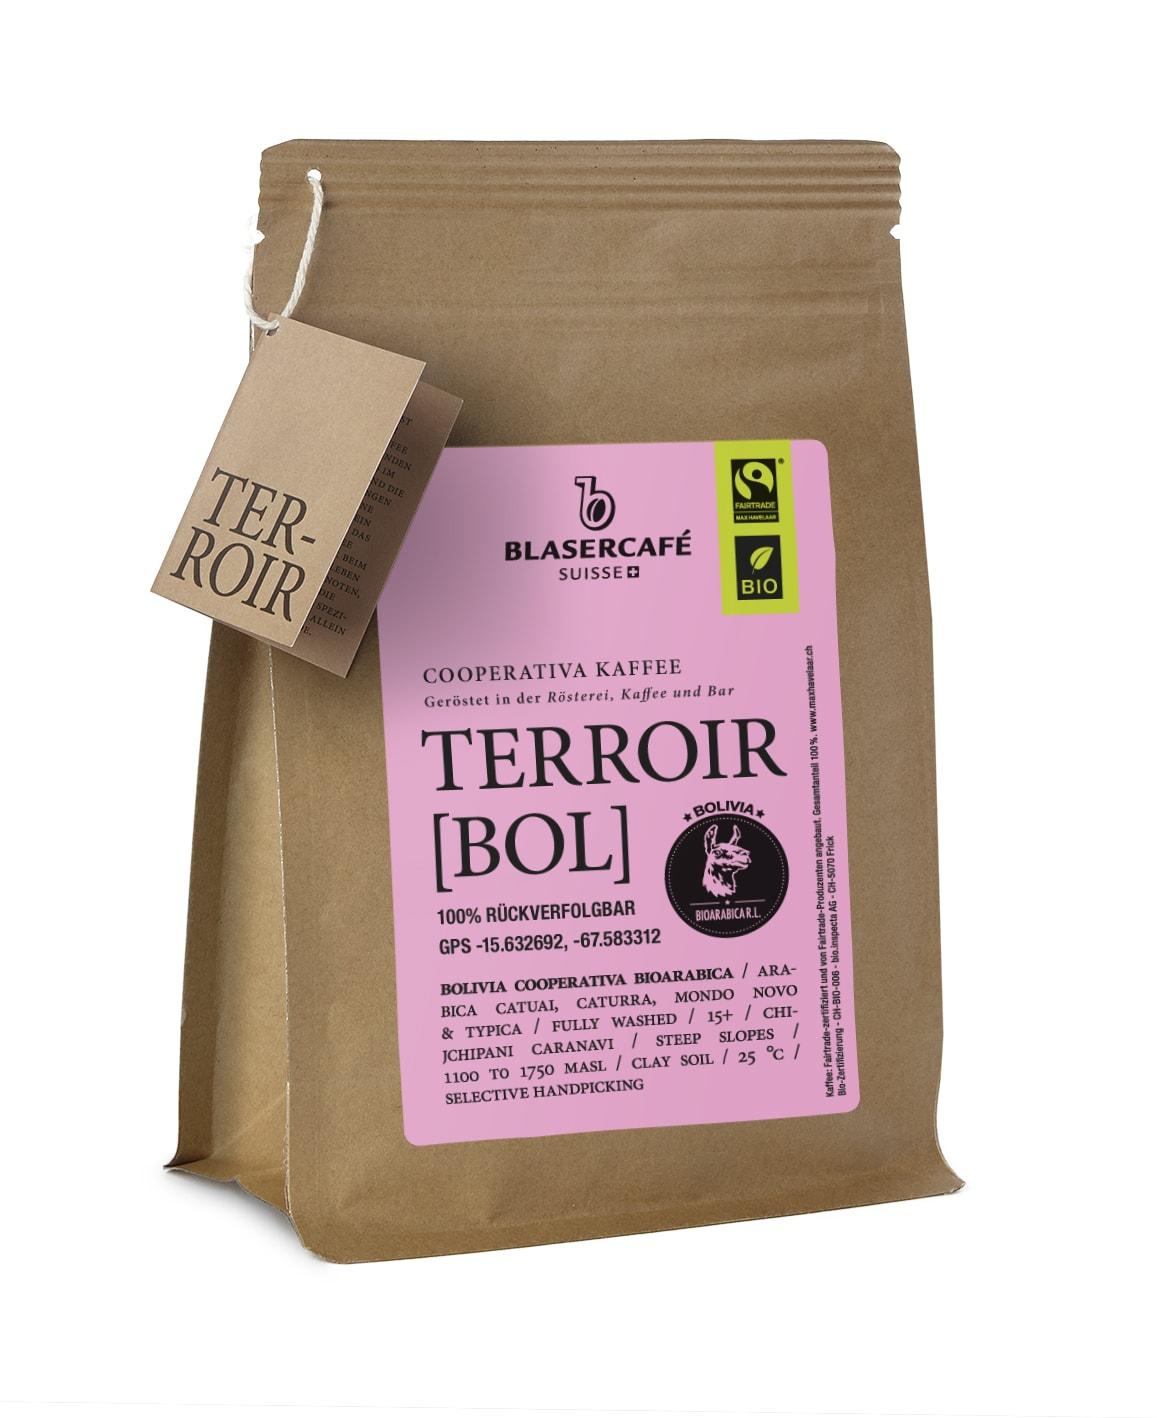 Terroir Bolivia bohnen